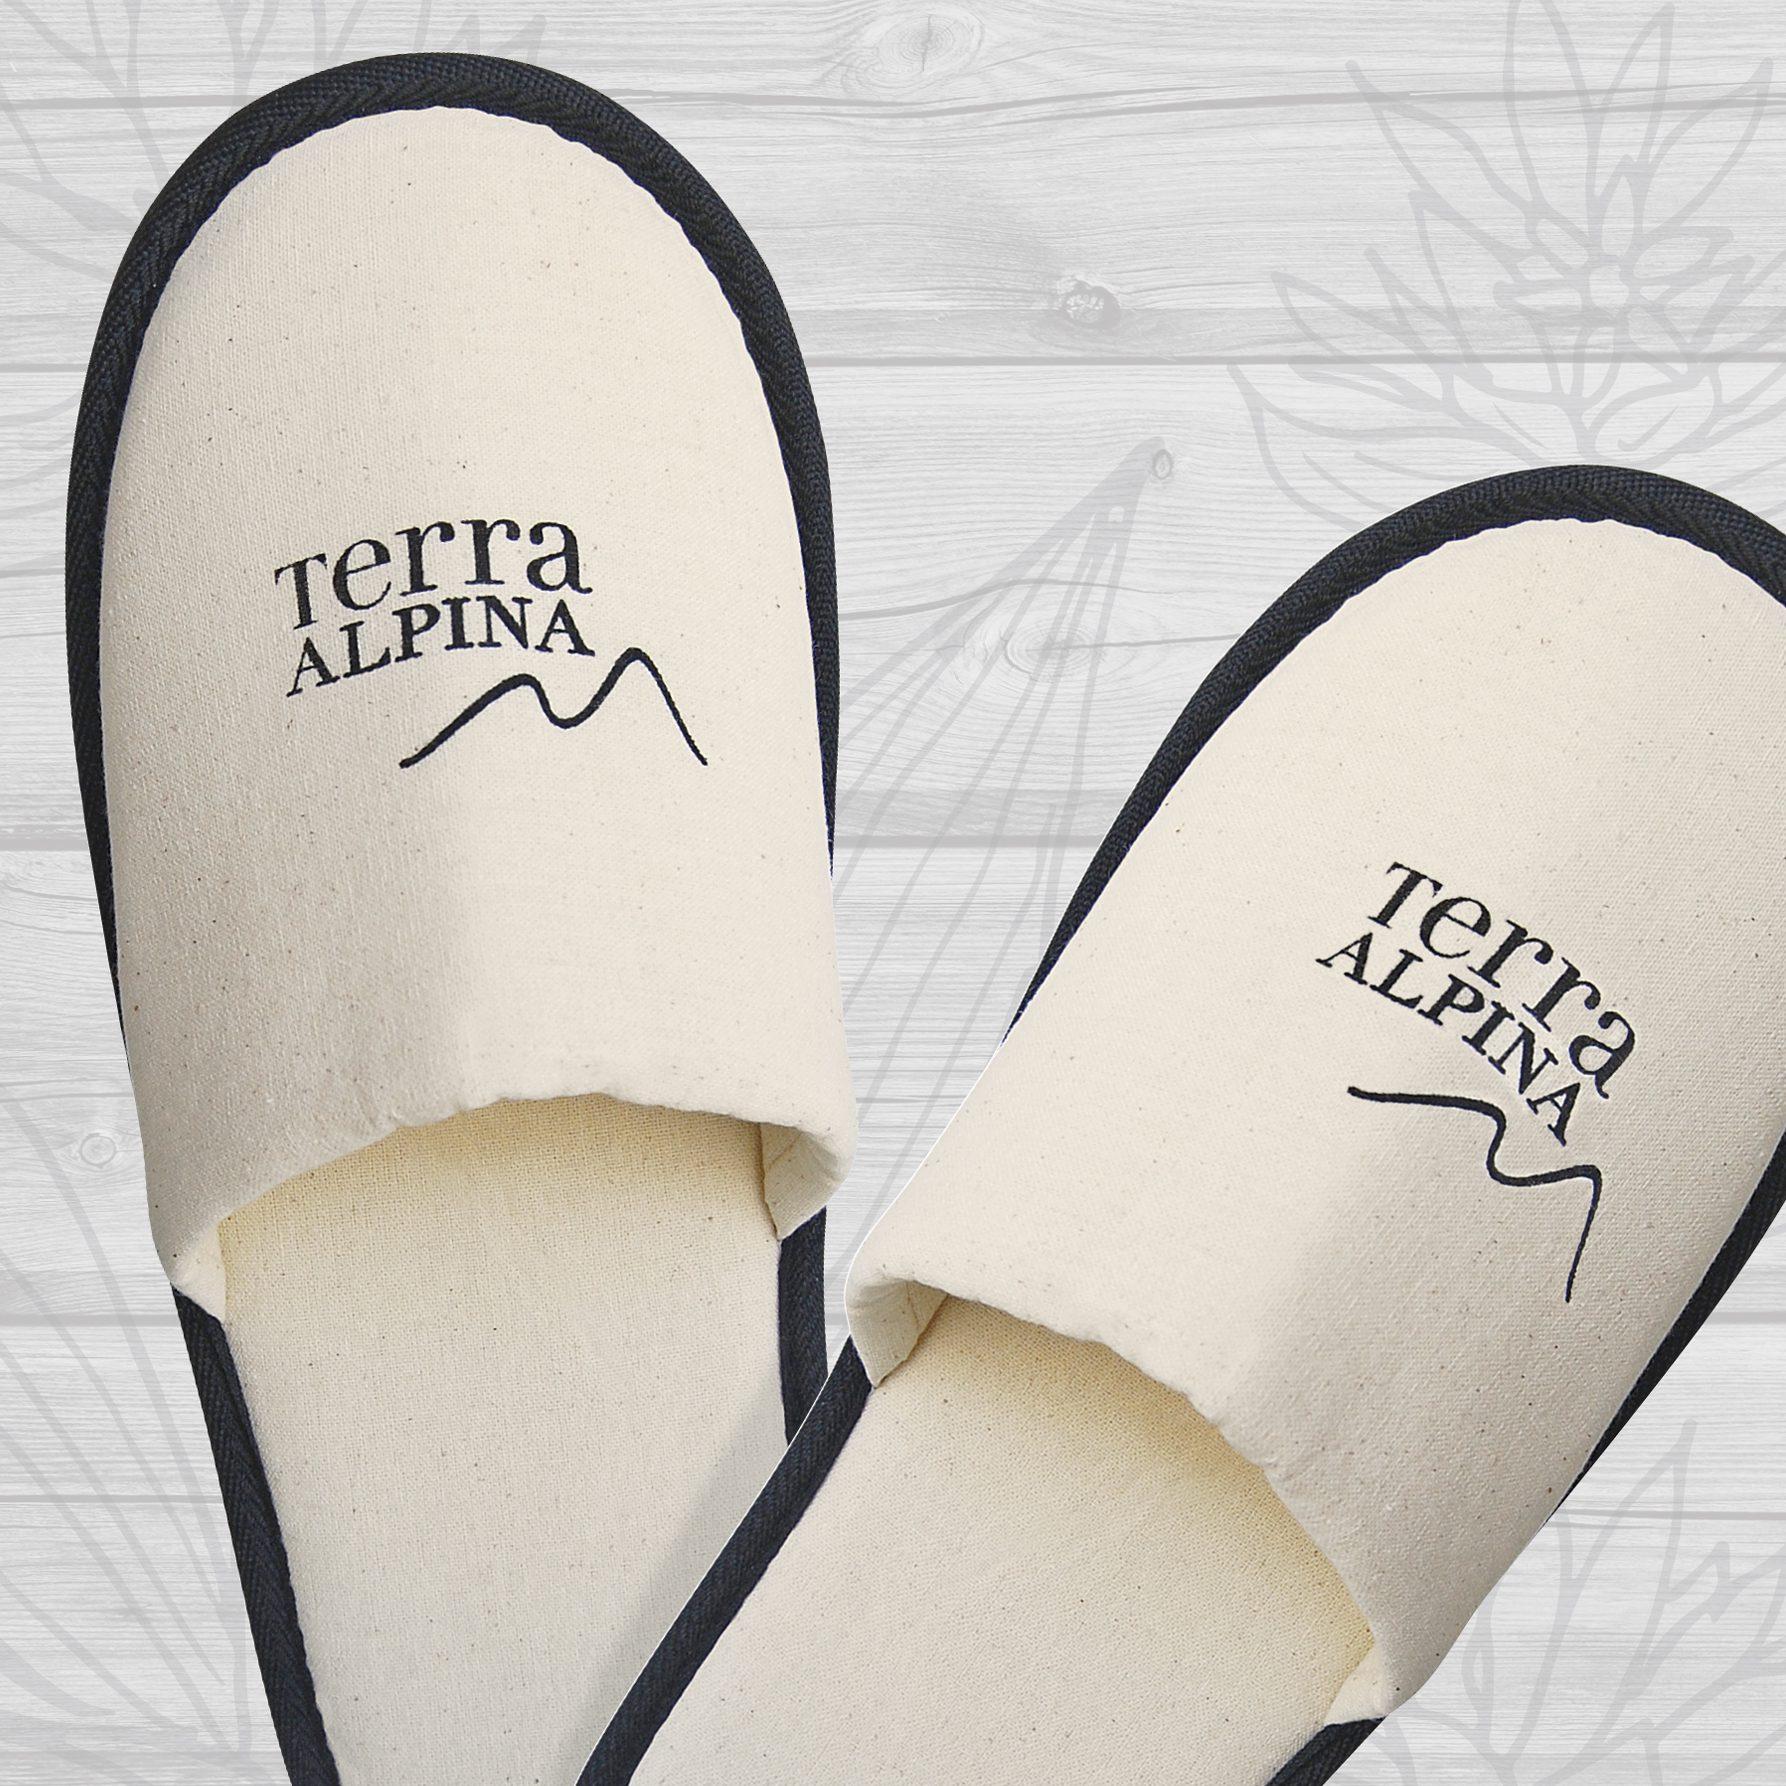 Terra Alpina Hotel Slippers